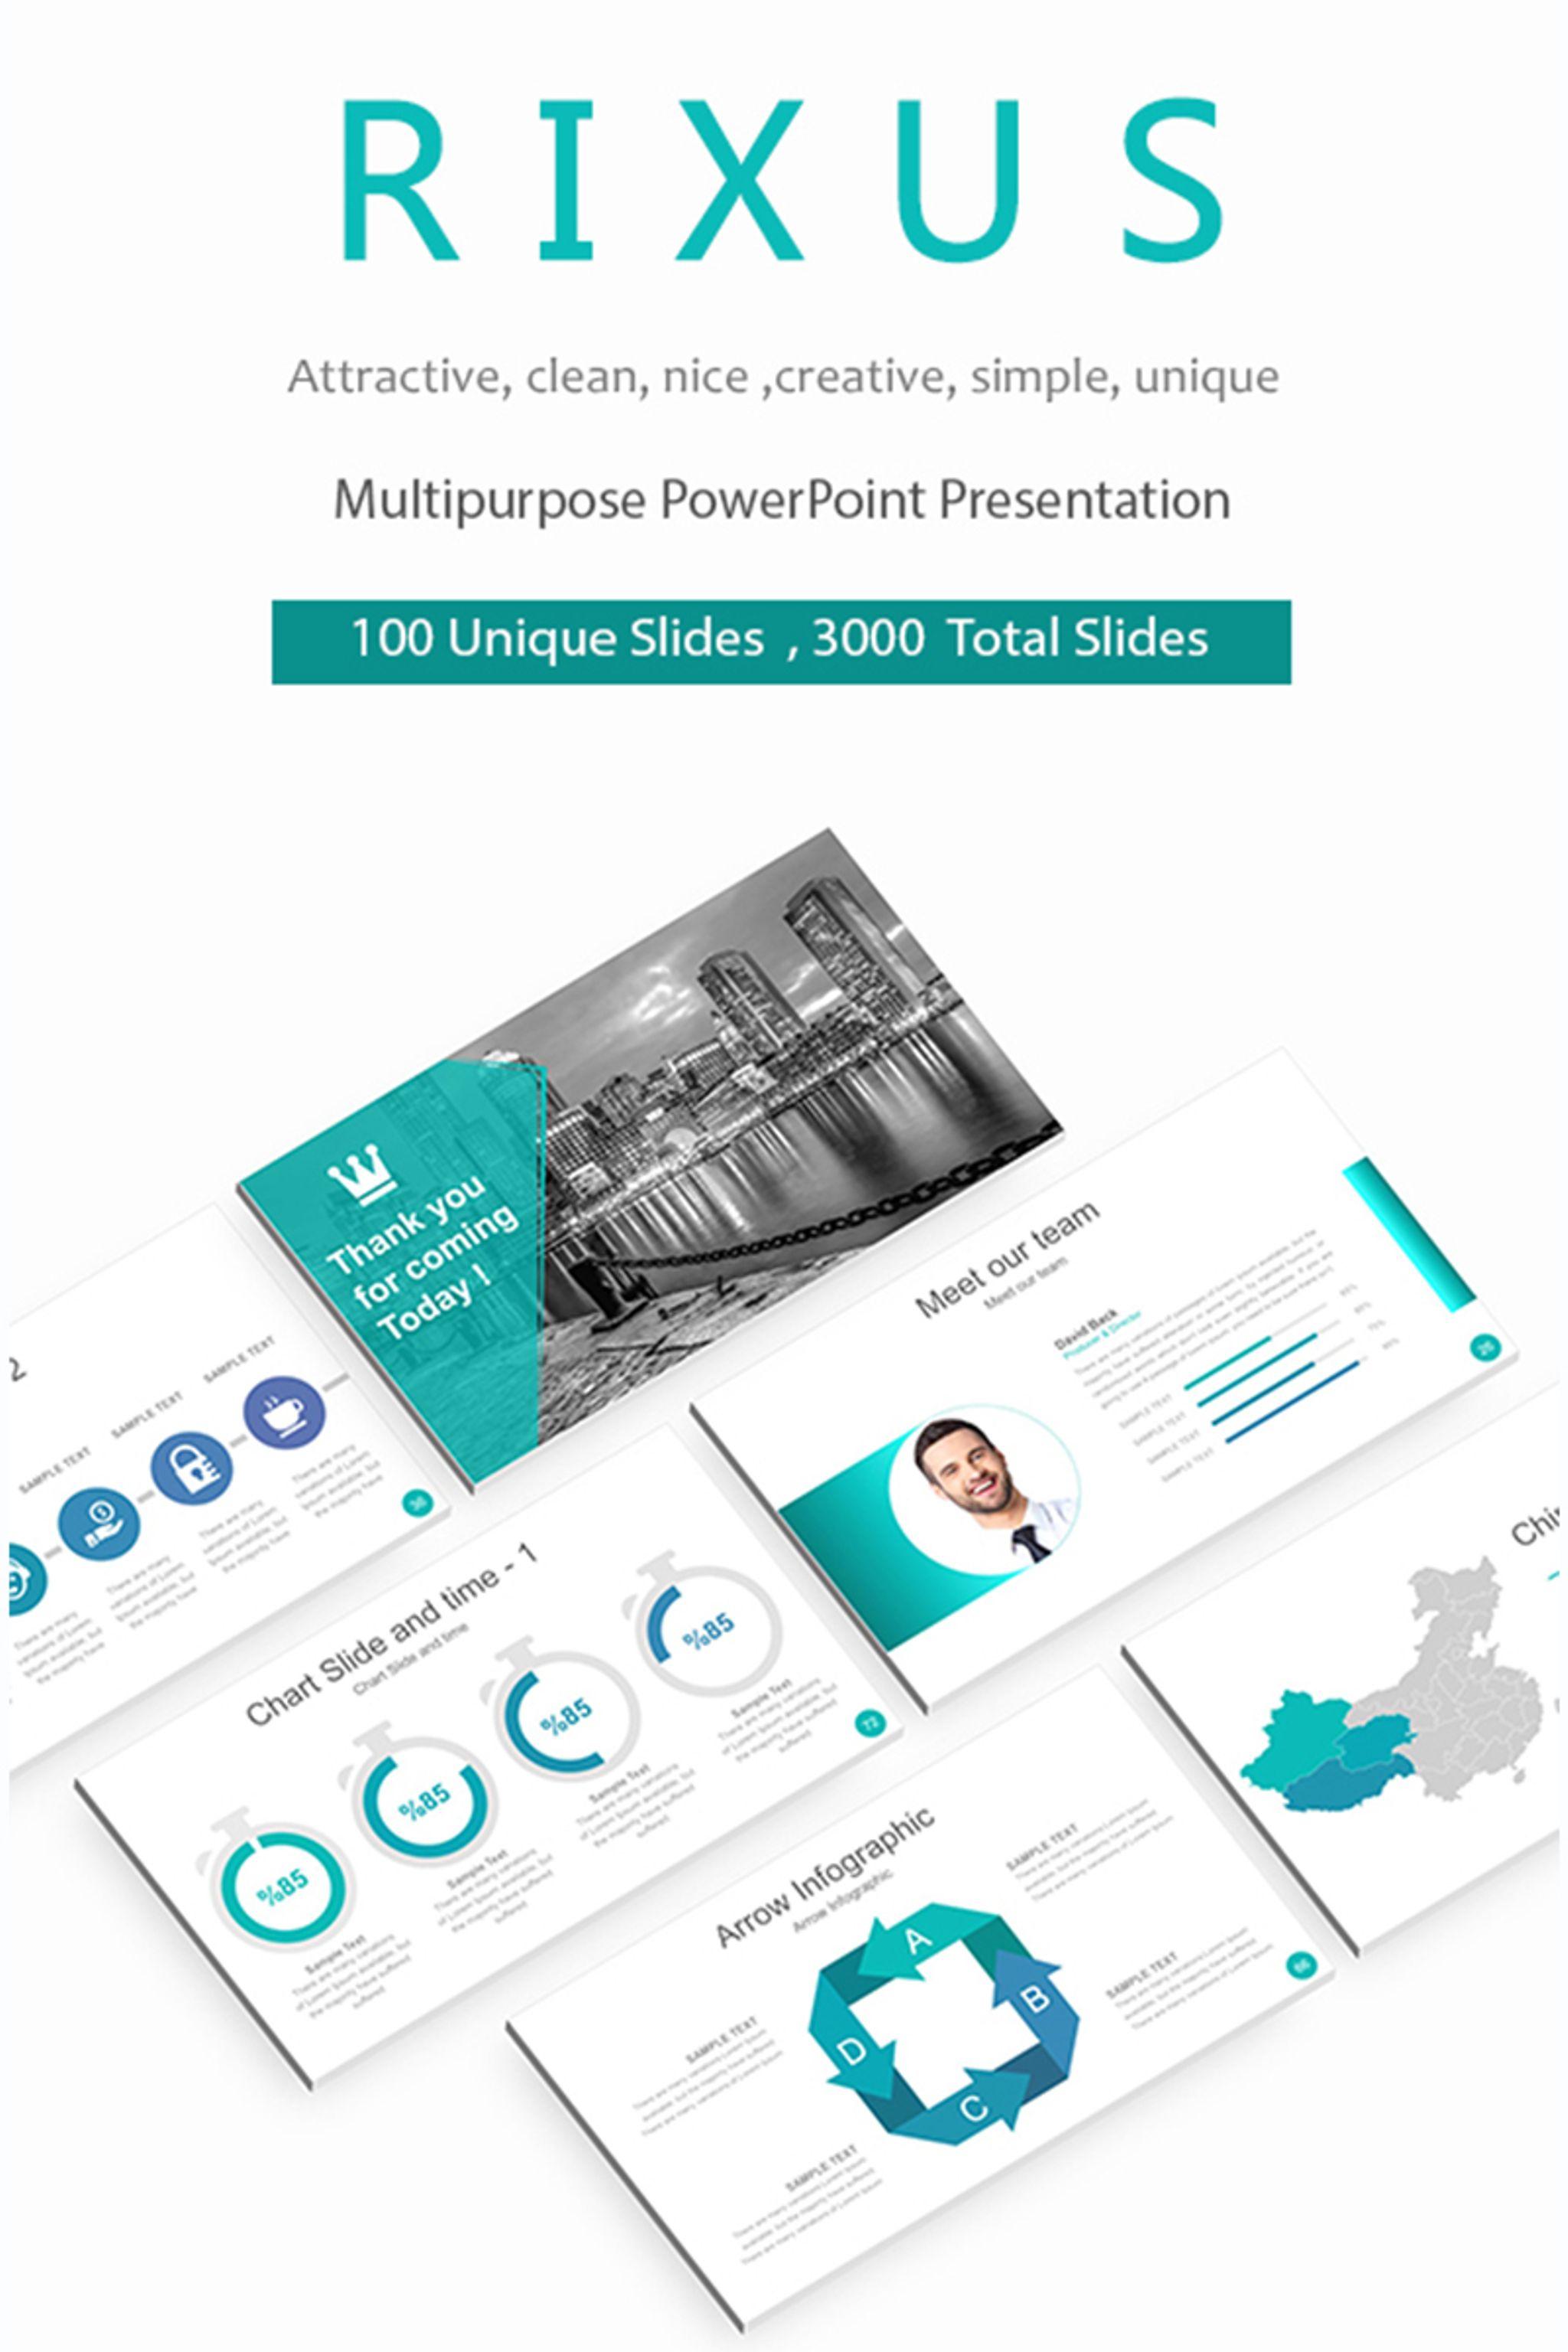 Rixus presentation powerpoint template 67073 rixus presentation powerpoint template alramifo Image collections